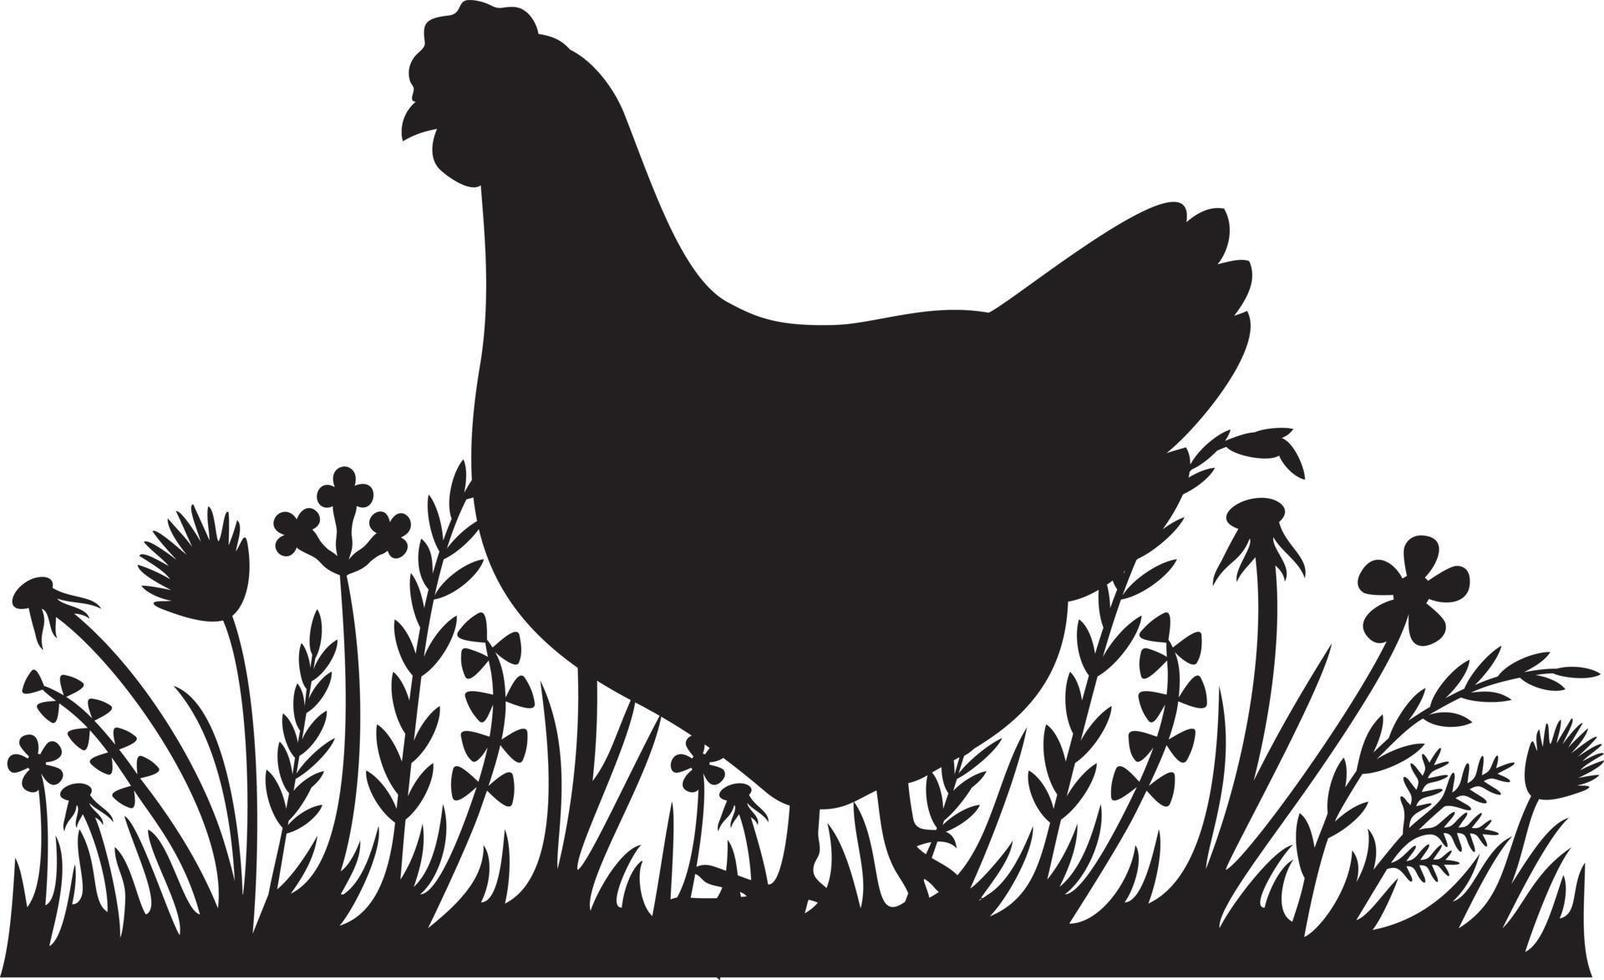 Huhn im Gras vektor